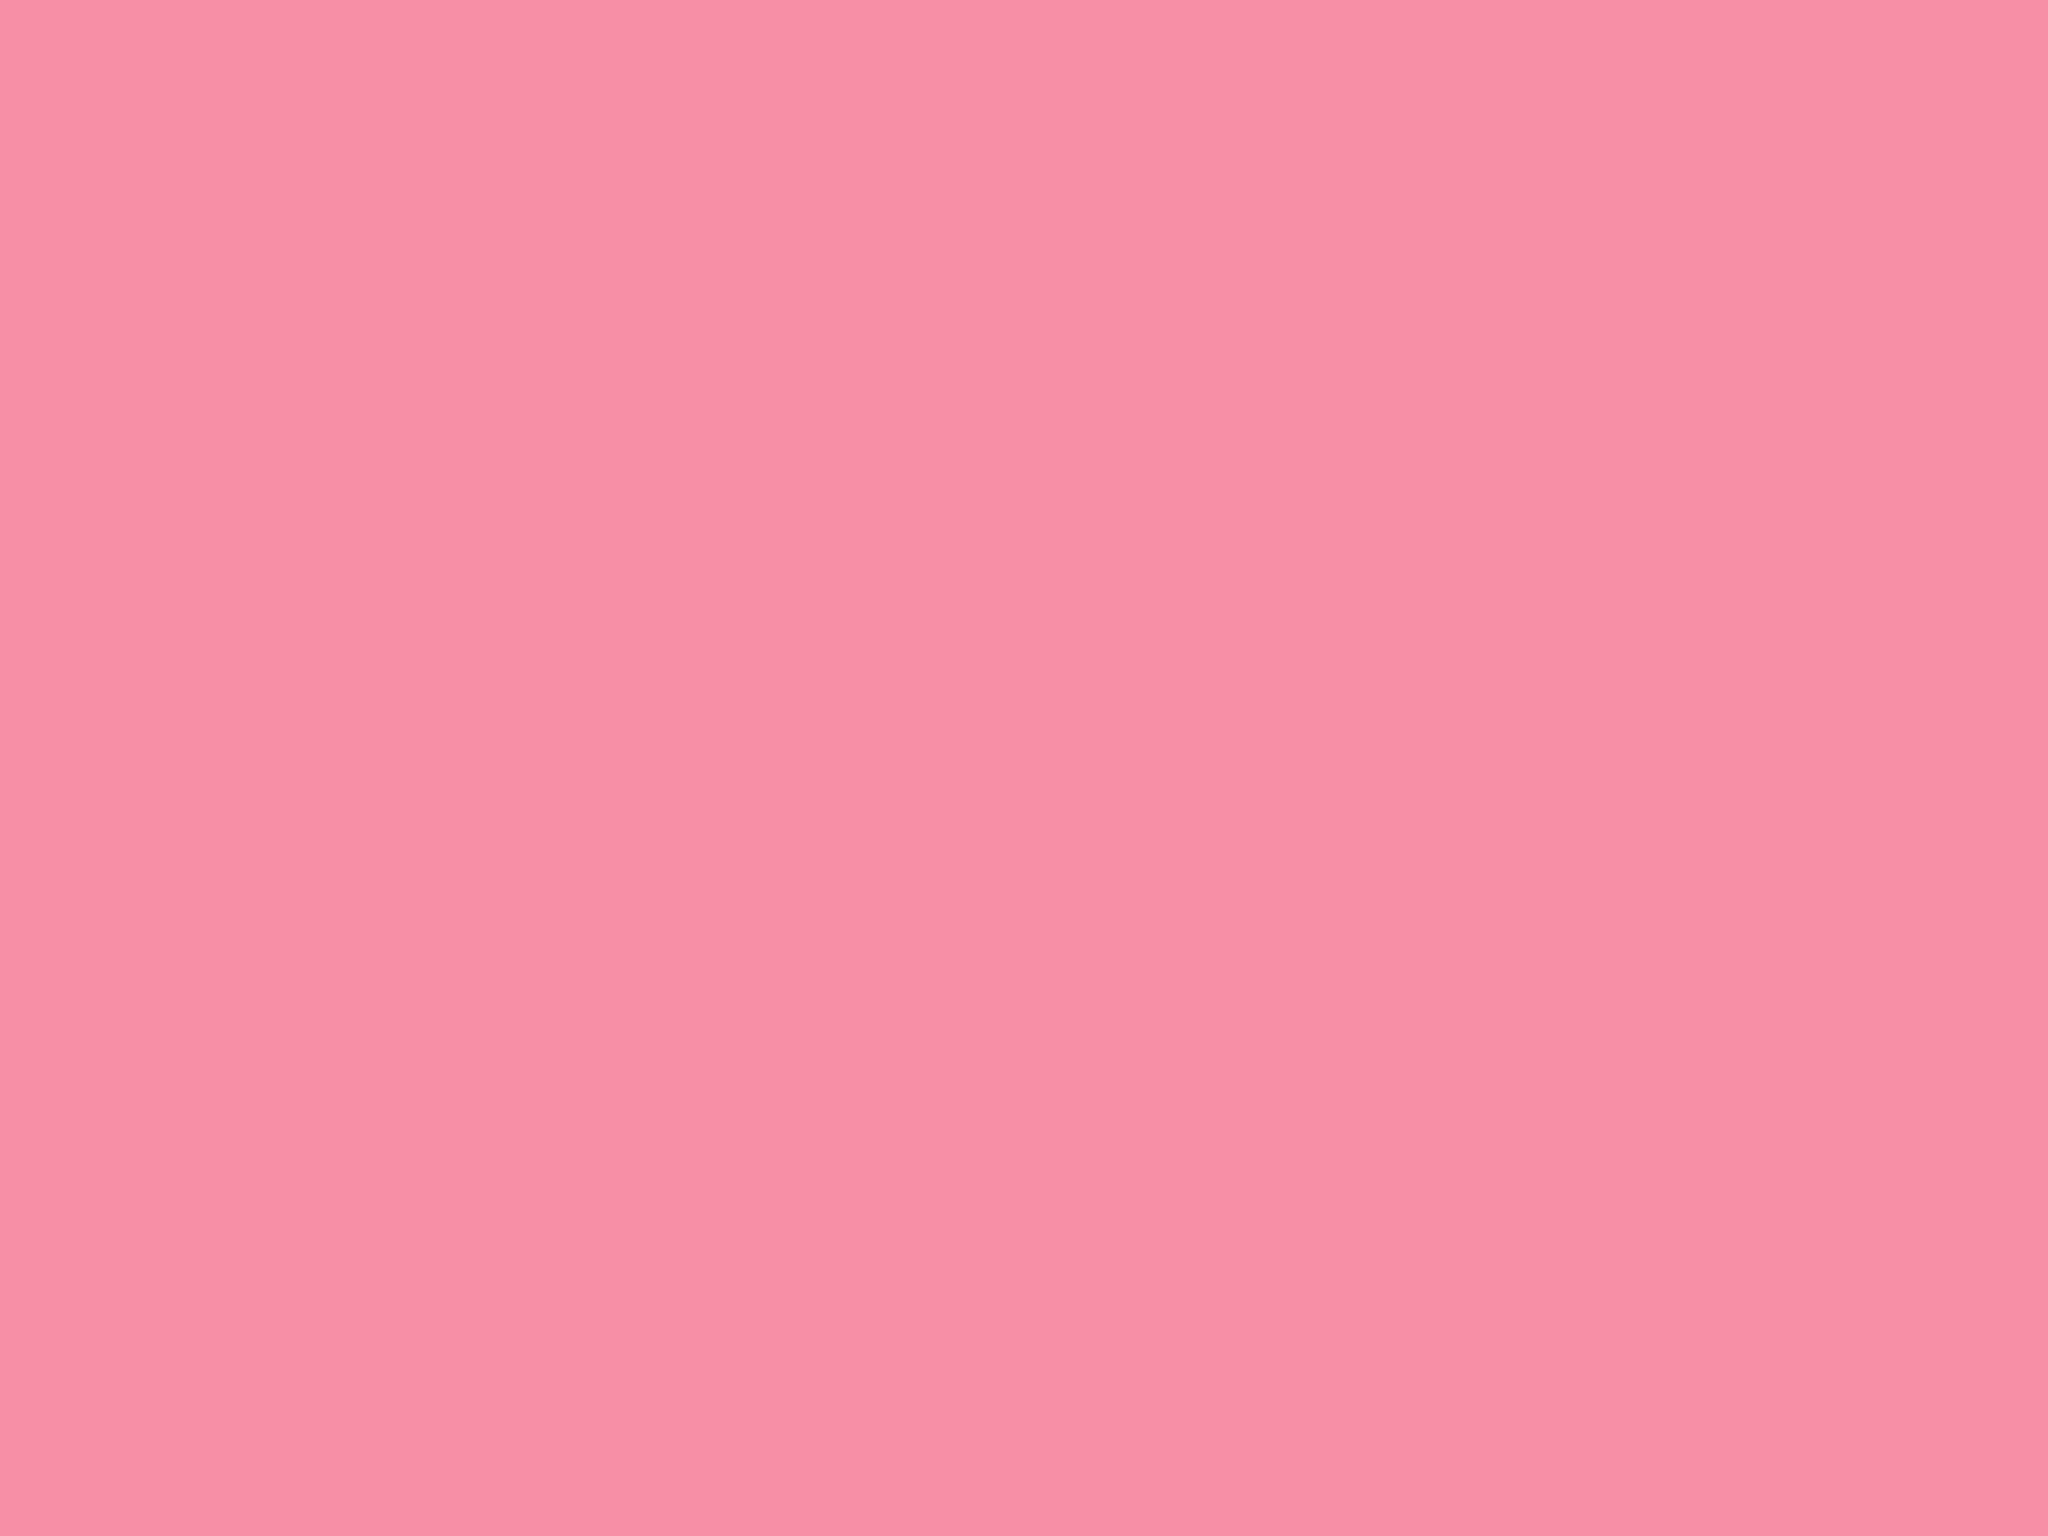 2048x1536 Pink Sherbet Solid Color Background